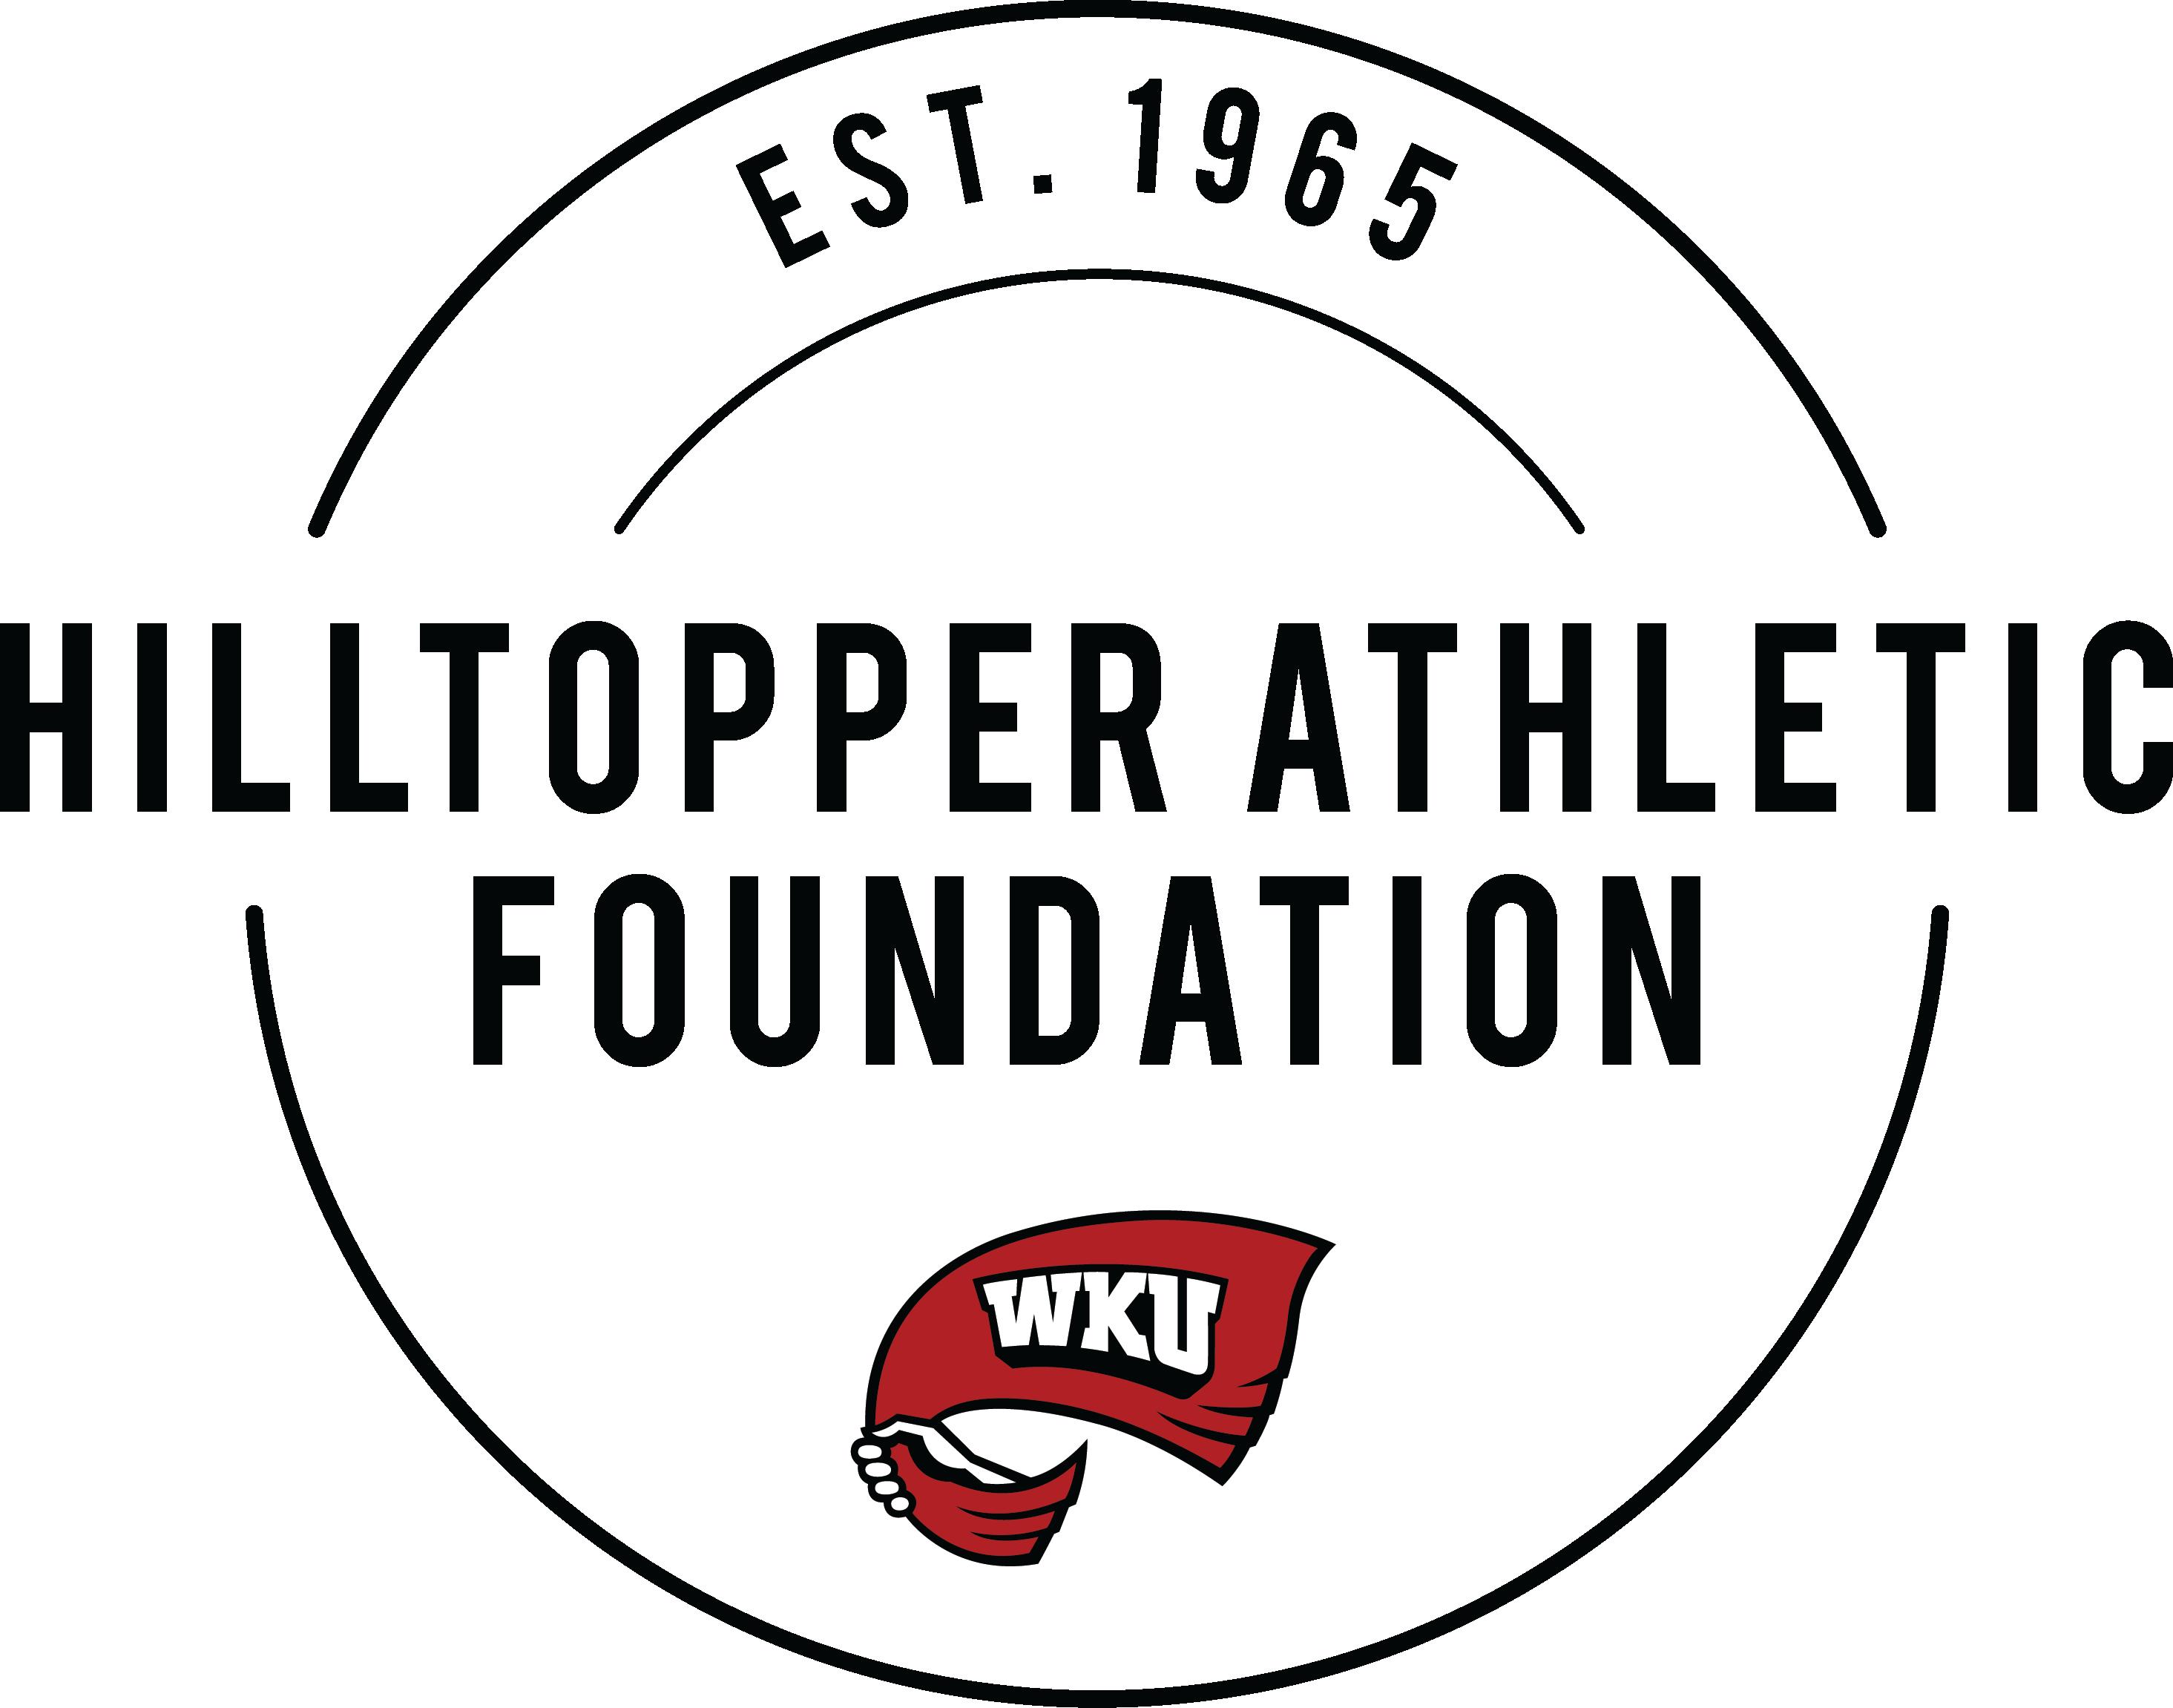 hilltoppers-athletic-foundation-logo